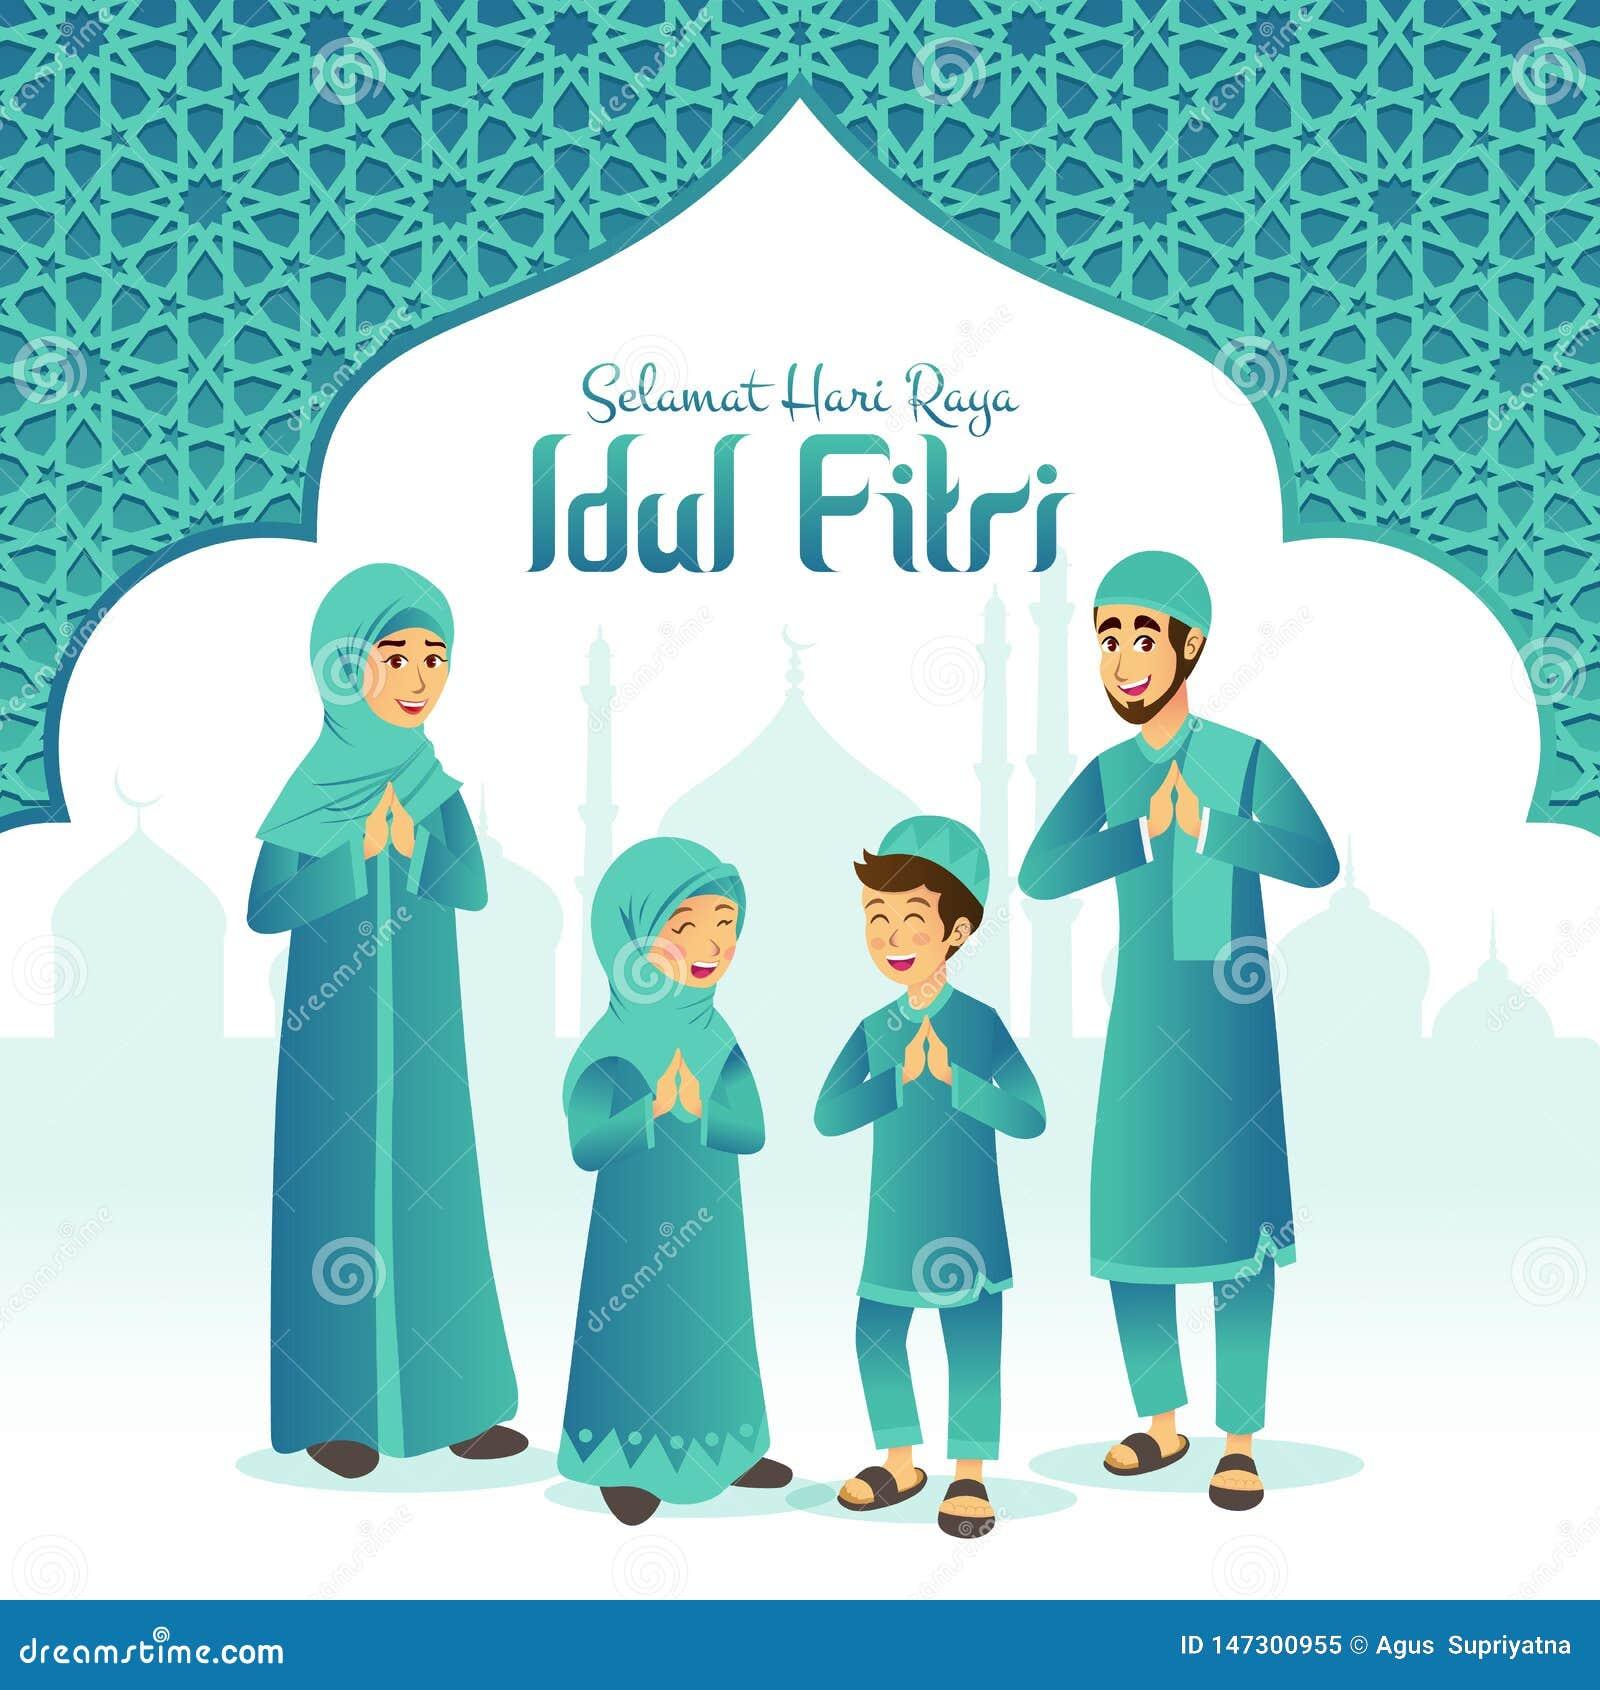 Raya Idul Fitri hari Selamat другой язык счастливого eid mubarak на индонезийском Семья мультфильма мусульманская празднуя fitr a